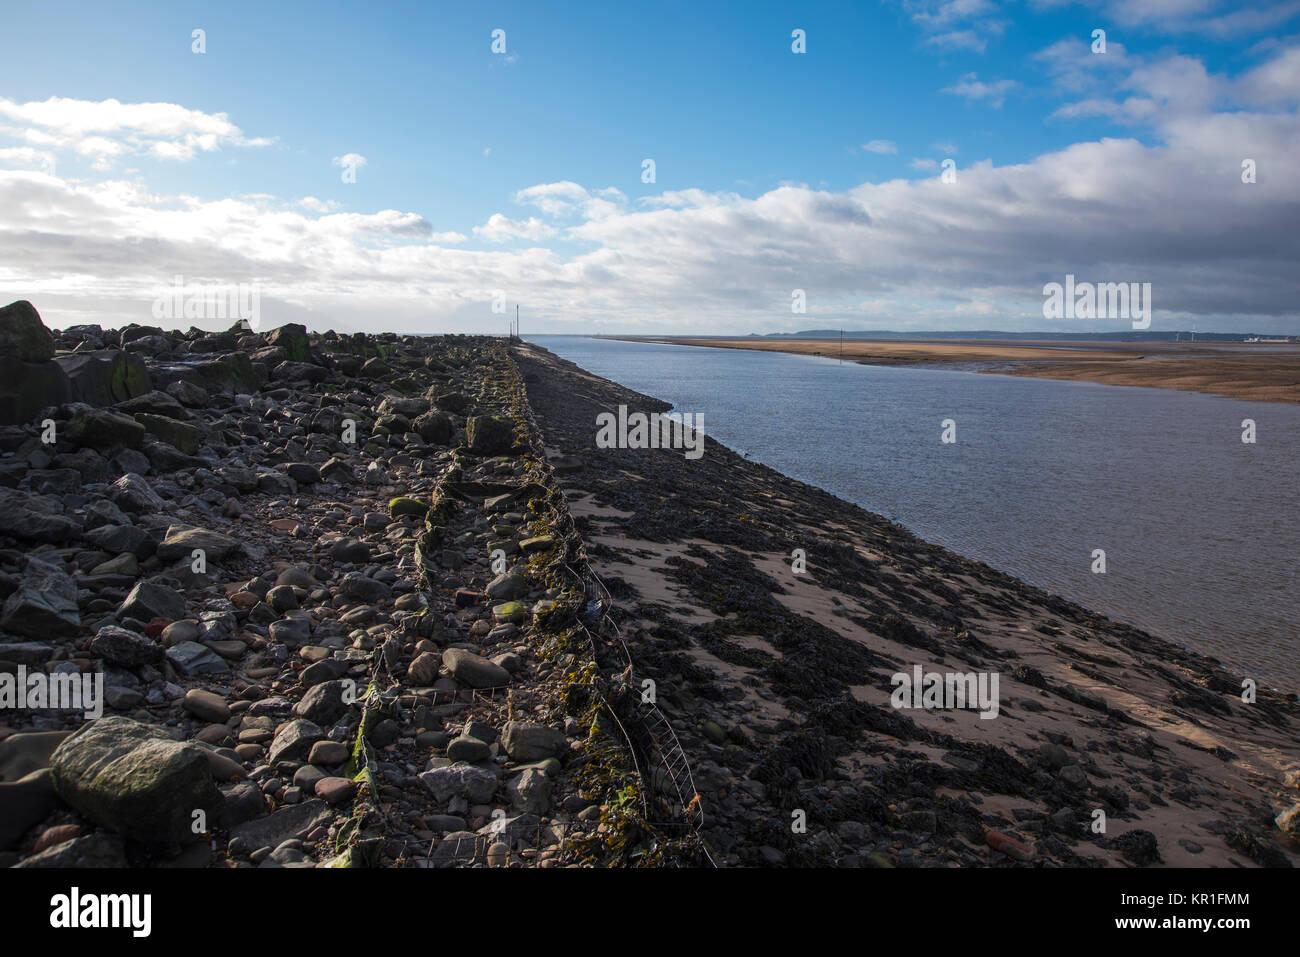 Baglan Bay and Aberavon Sands, West Glamorgan, South Wales, UK. Stock Photo